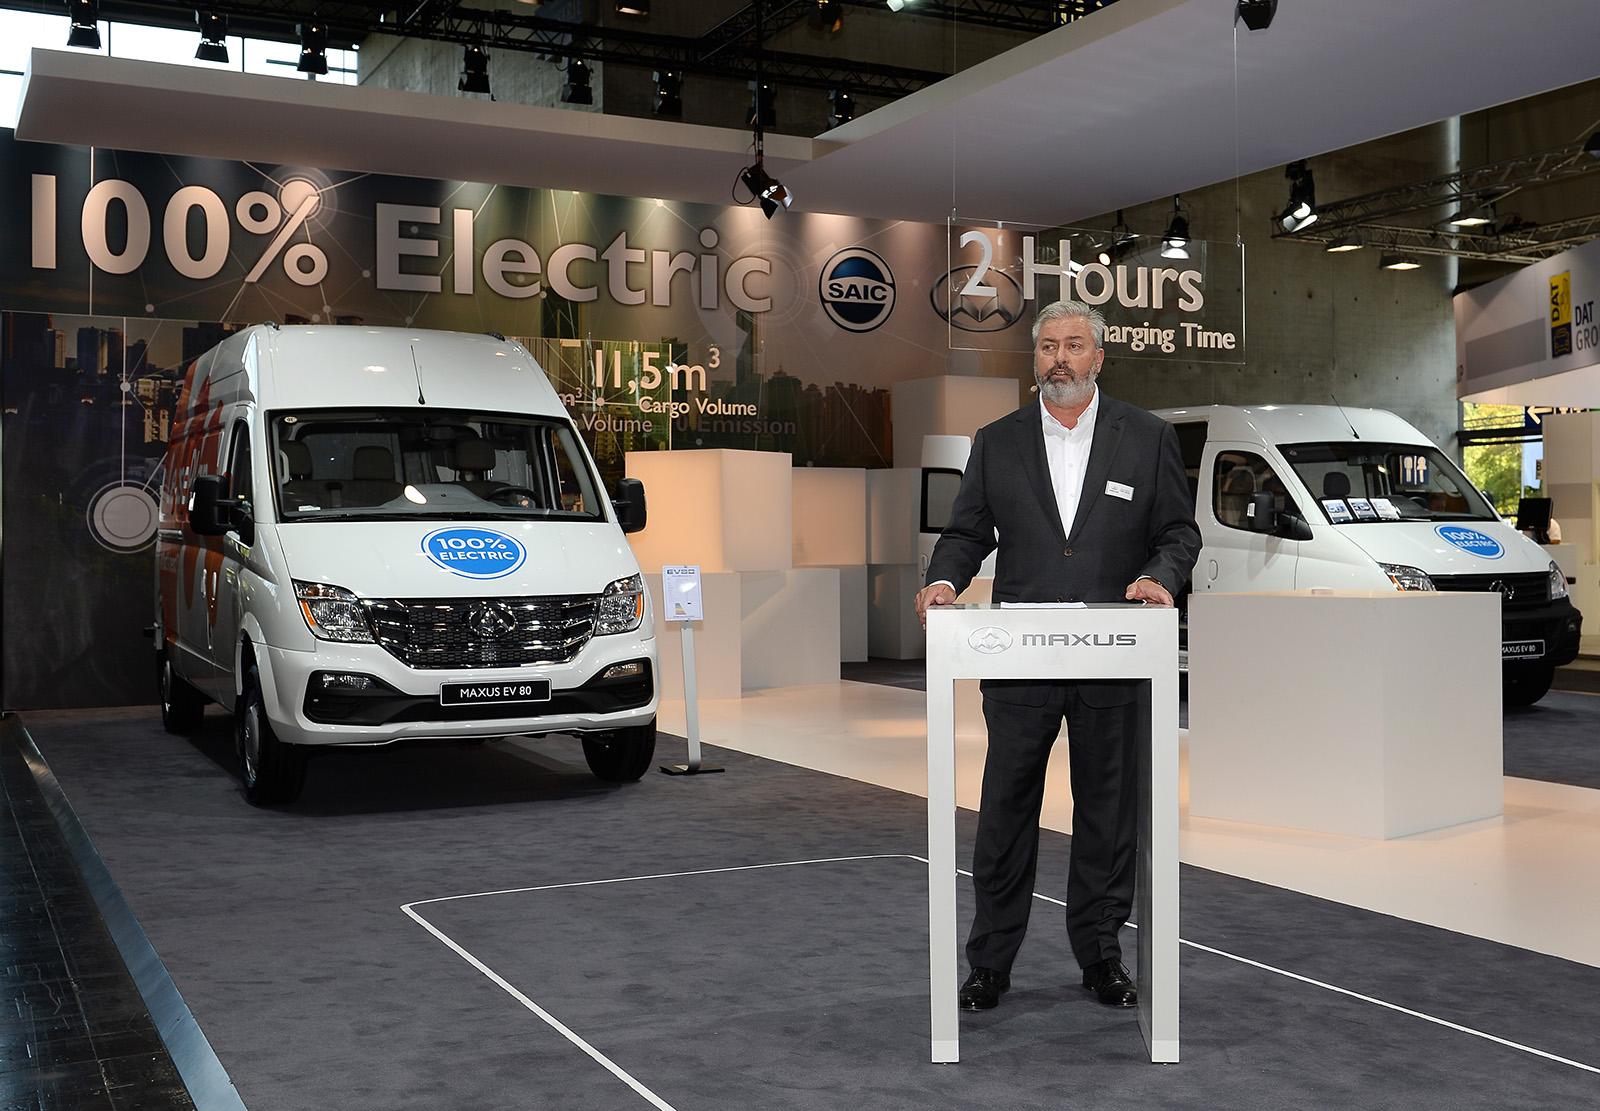 Maxus EV80 furgoneta eléctrica